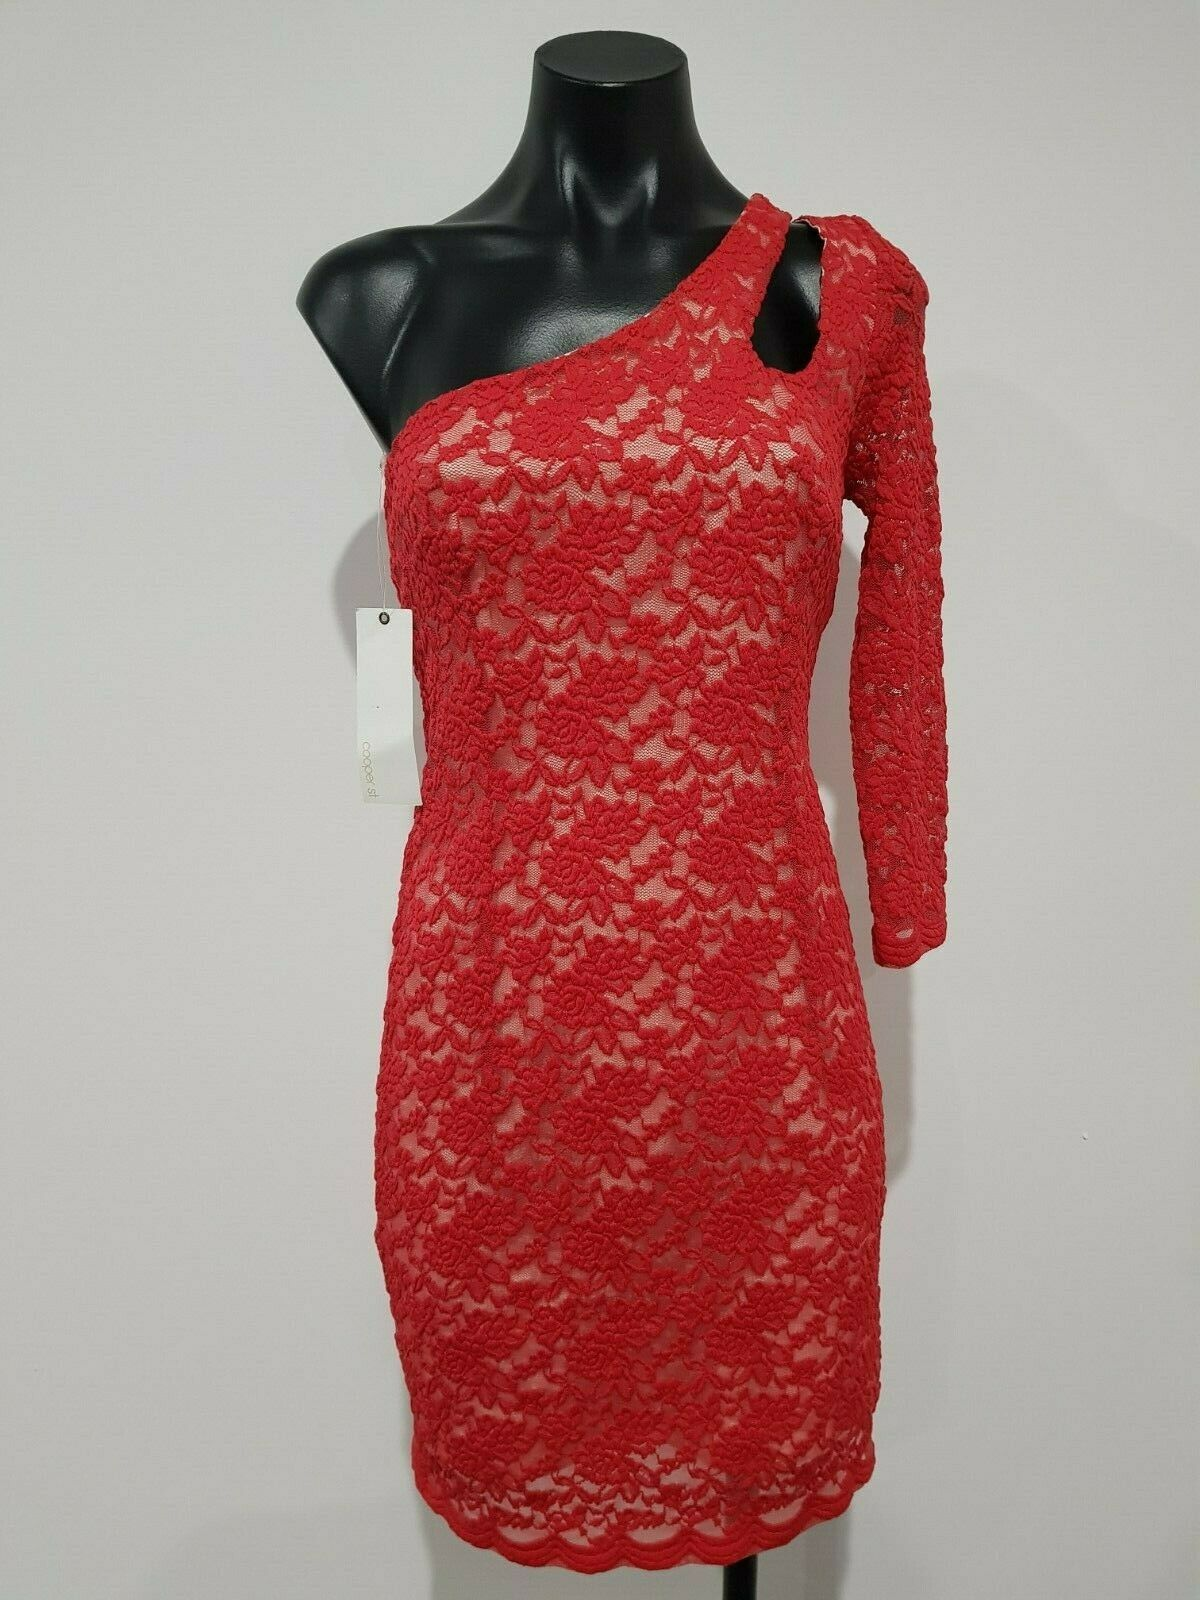 Cooper St Größe 6 damen One Shoulder Long Sleeve rot Lace Bodycon Dress NEW